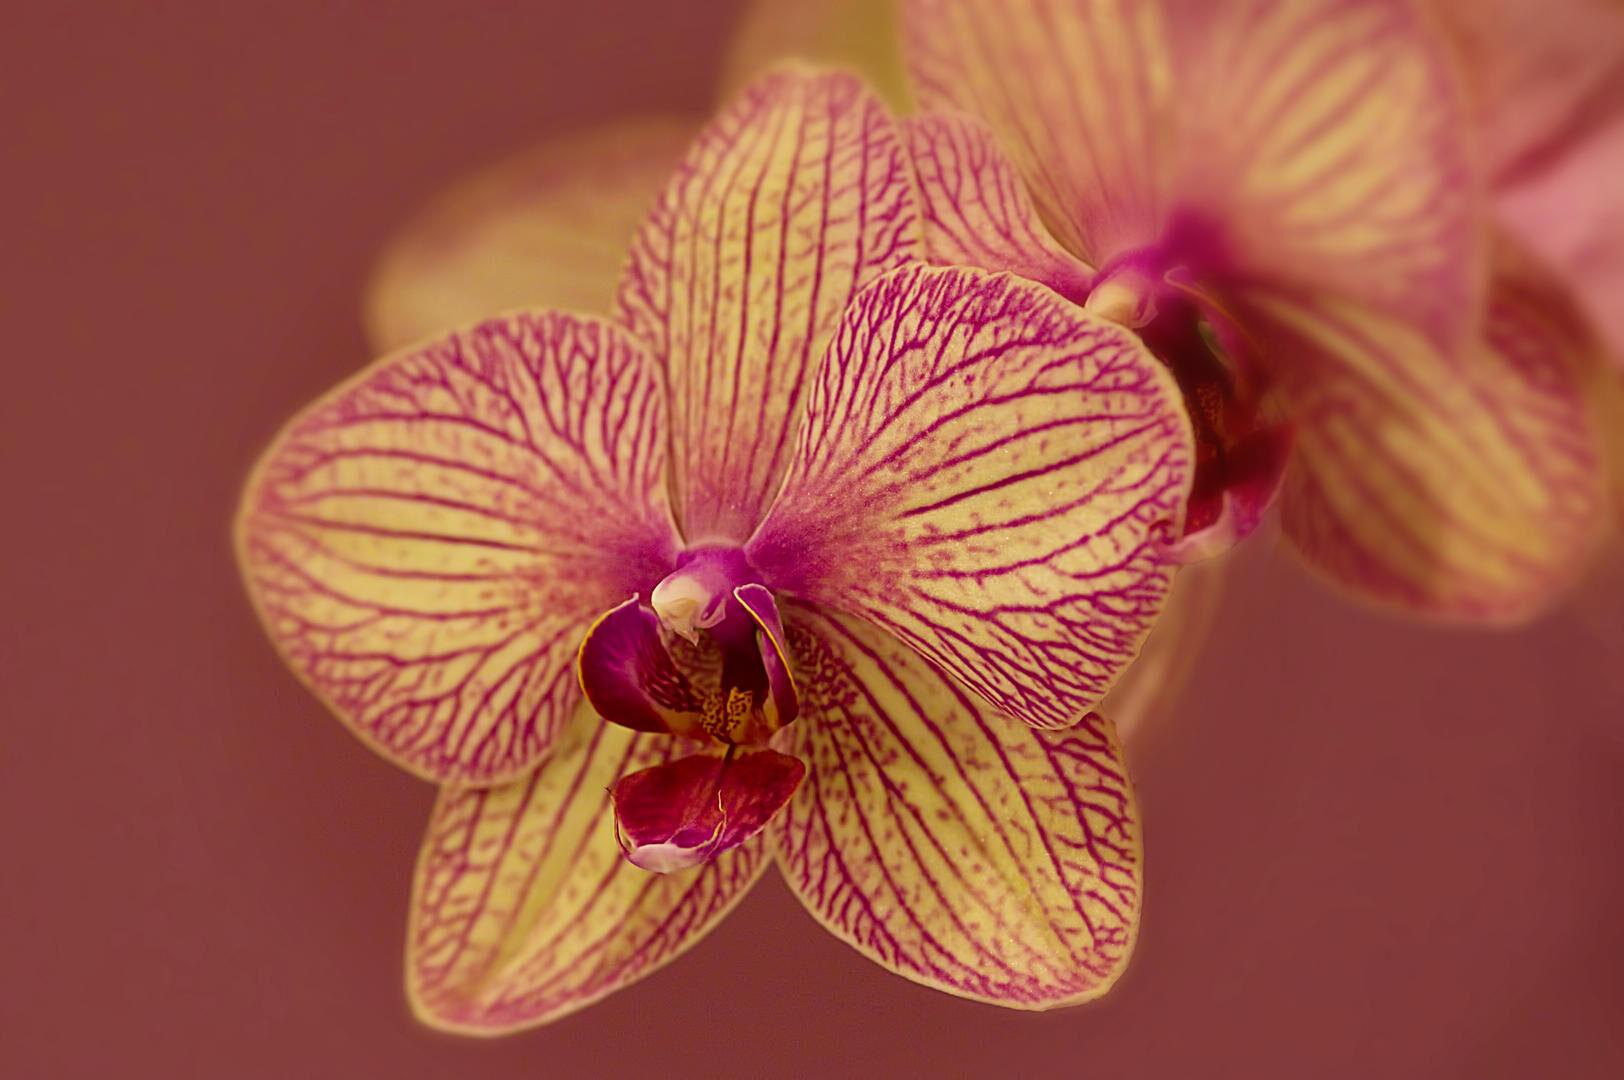 orkideler nerede yetişir ?